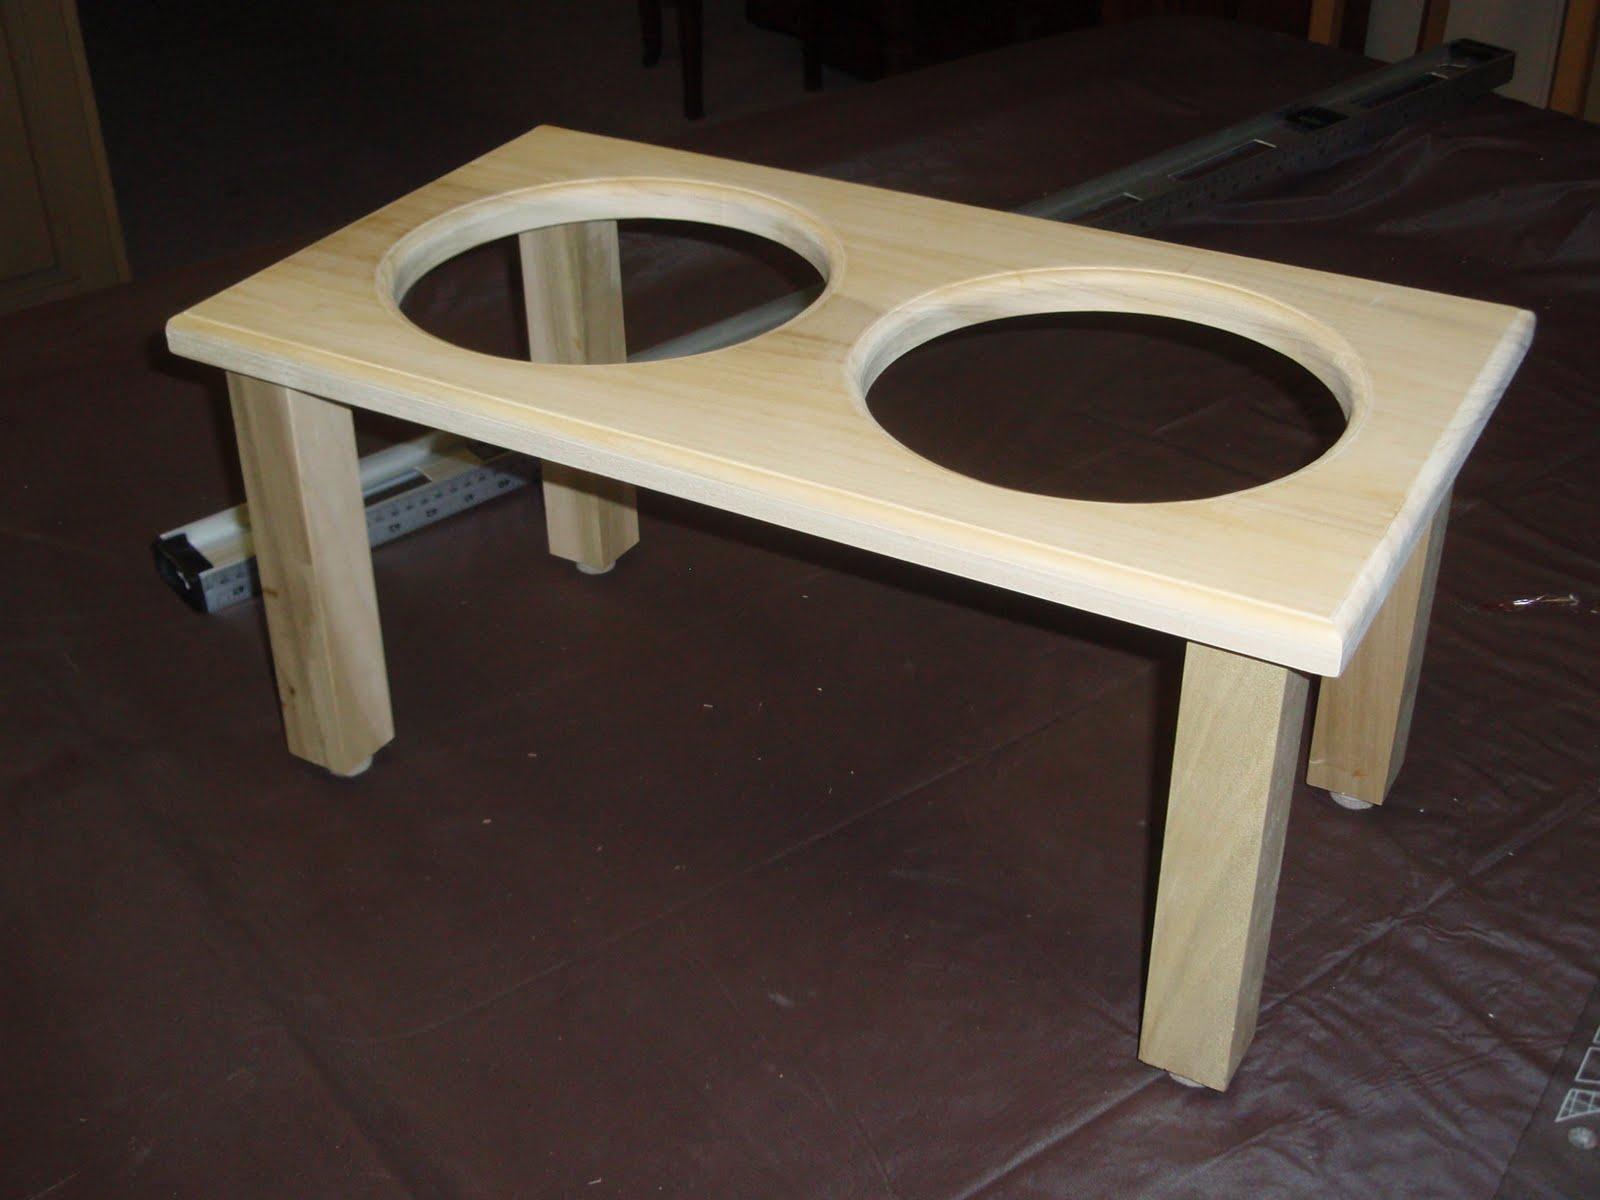 Wood Work Mann: Ruby's Dog Bowl Stand - photo#46